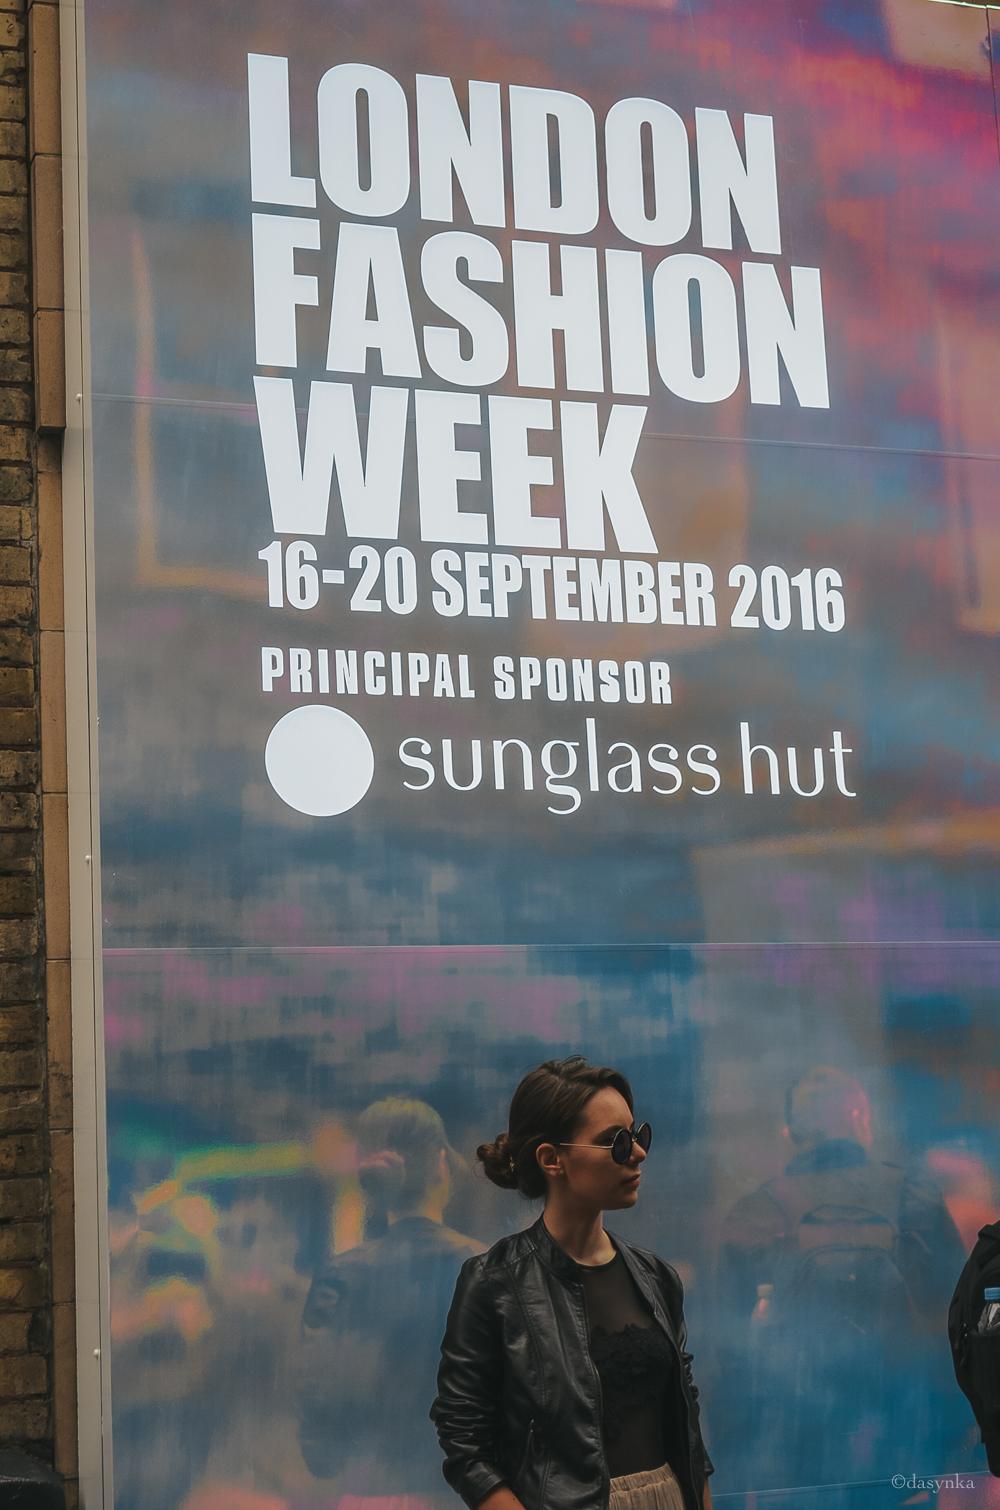 dasynka-fashion-blogger-london-life-street-style-big-ben-pinterest-skirt-pink-black-bag-white-look-leather-jacket-skirt-long-hair-zara-hm-asos-hermes-week